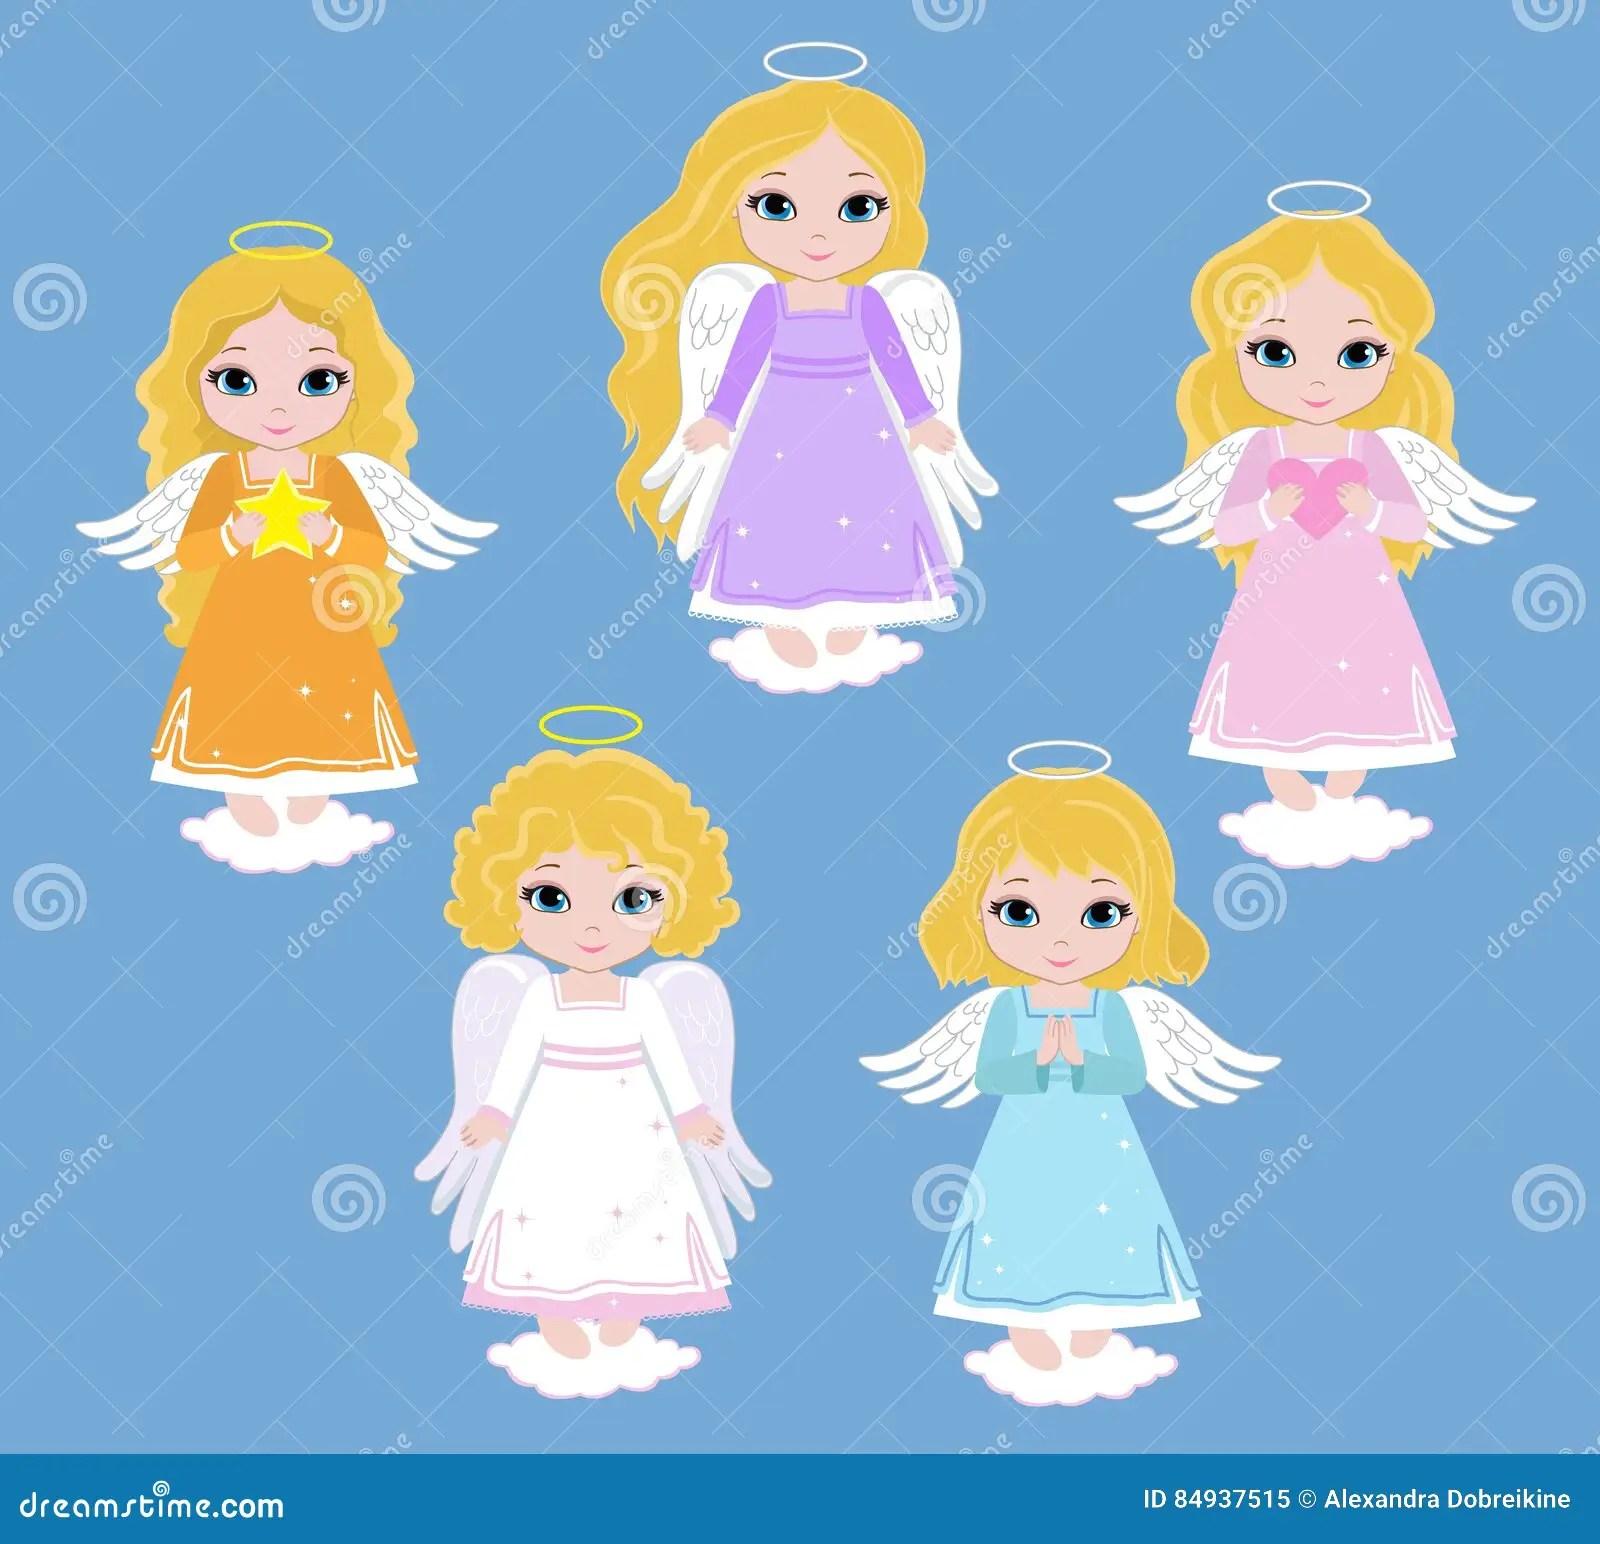 hight resolution of angel digital clipart set angel girls baptism